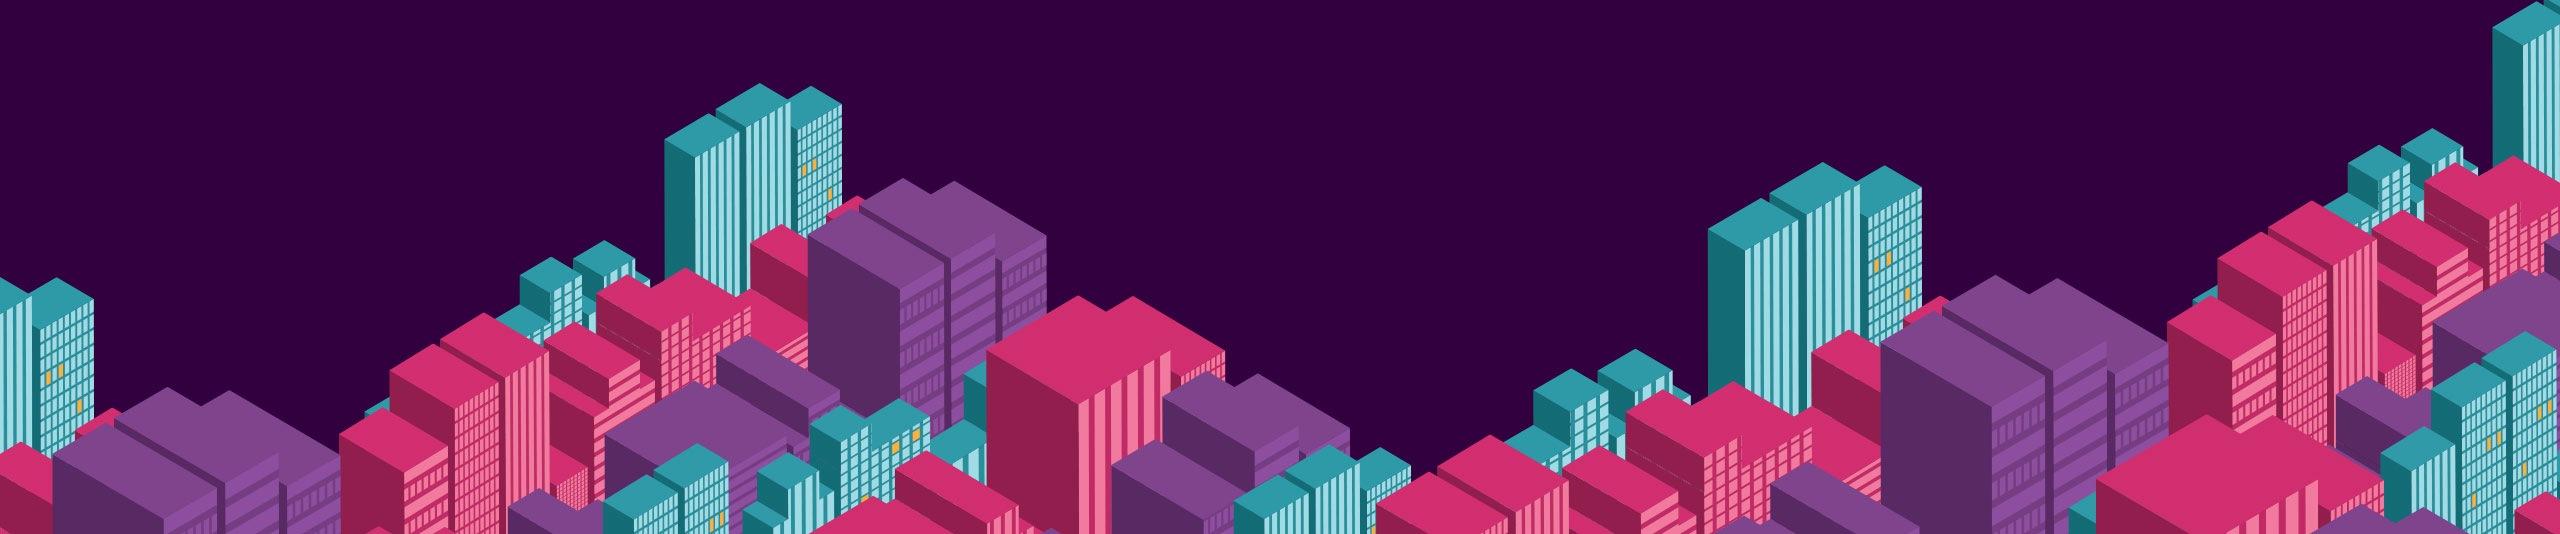 Easy Isometric City Setup in Adobe Illustrator